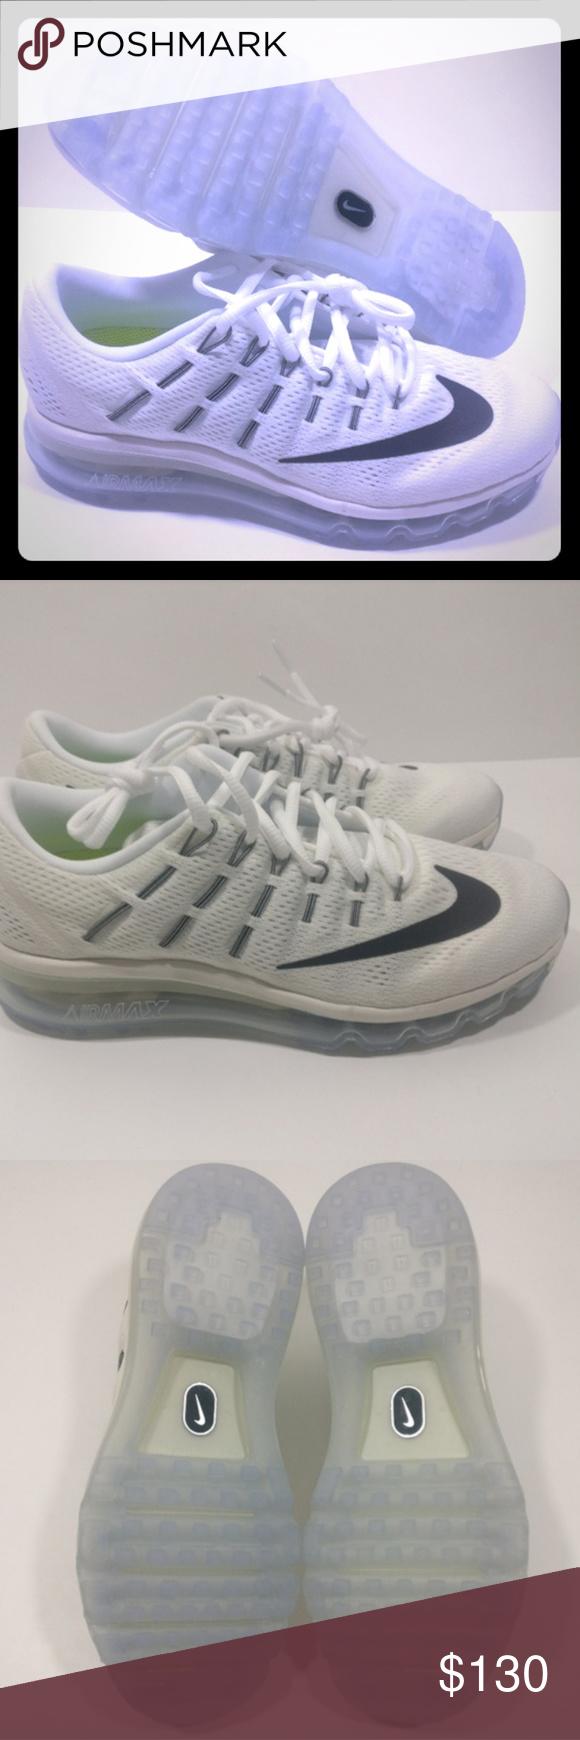 detailing 94159 04ab4 🔥NIKE AIR MAX Womans Nike Air Max, running sneakers. 100 ...